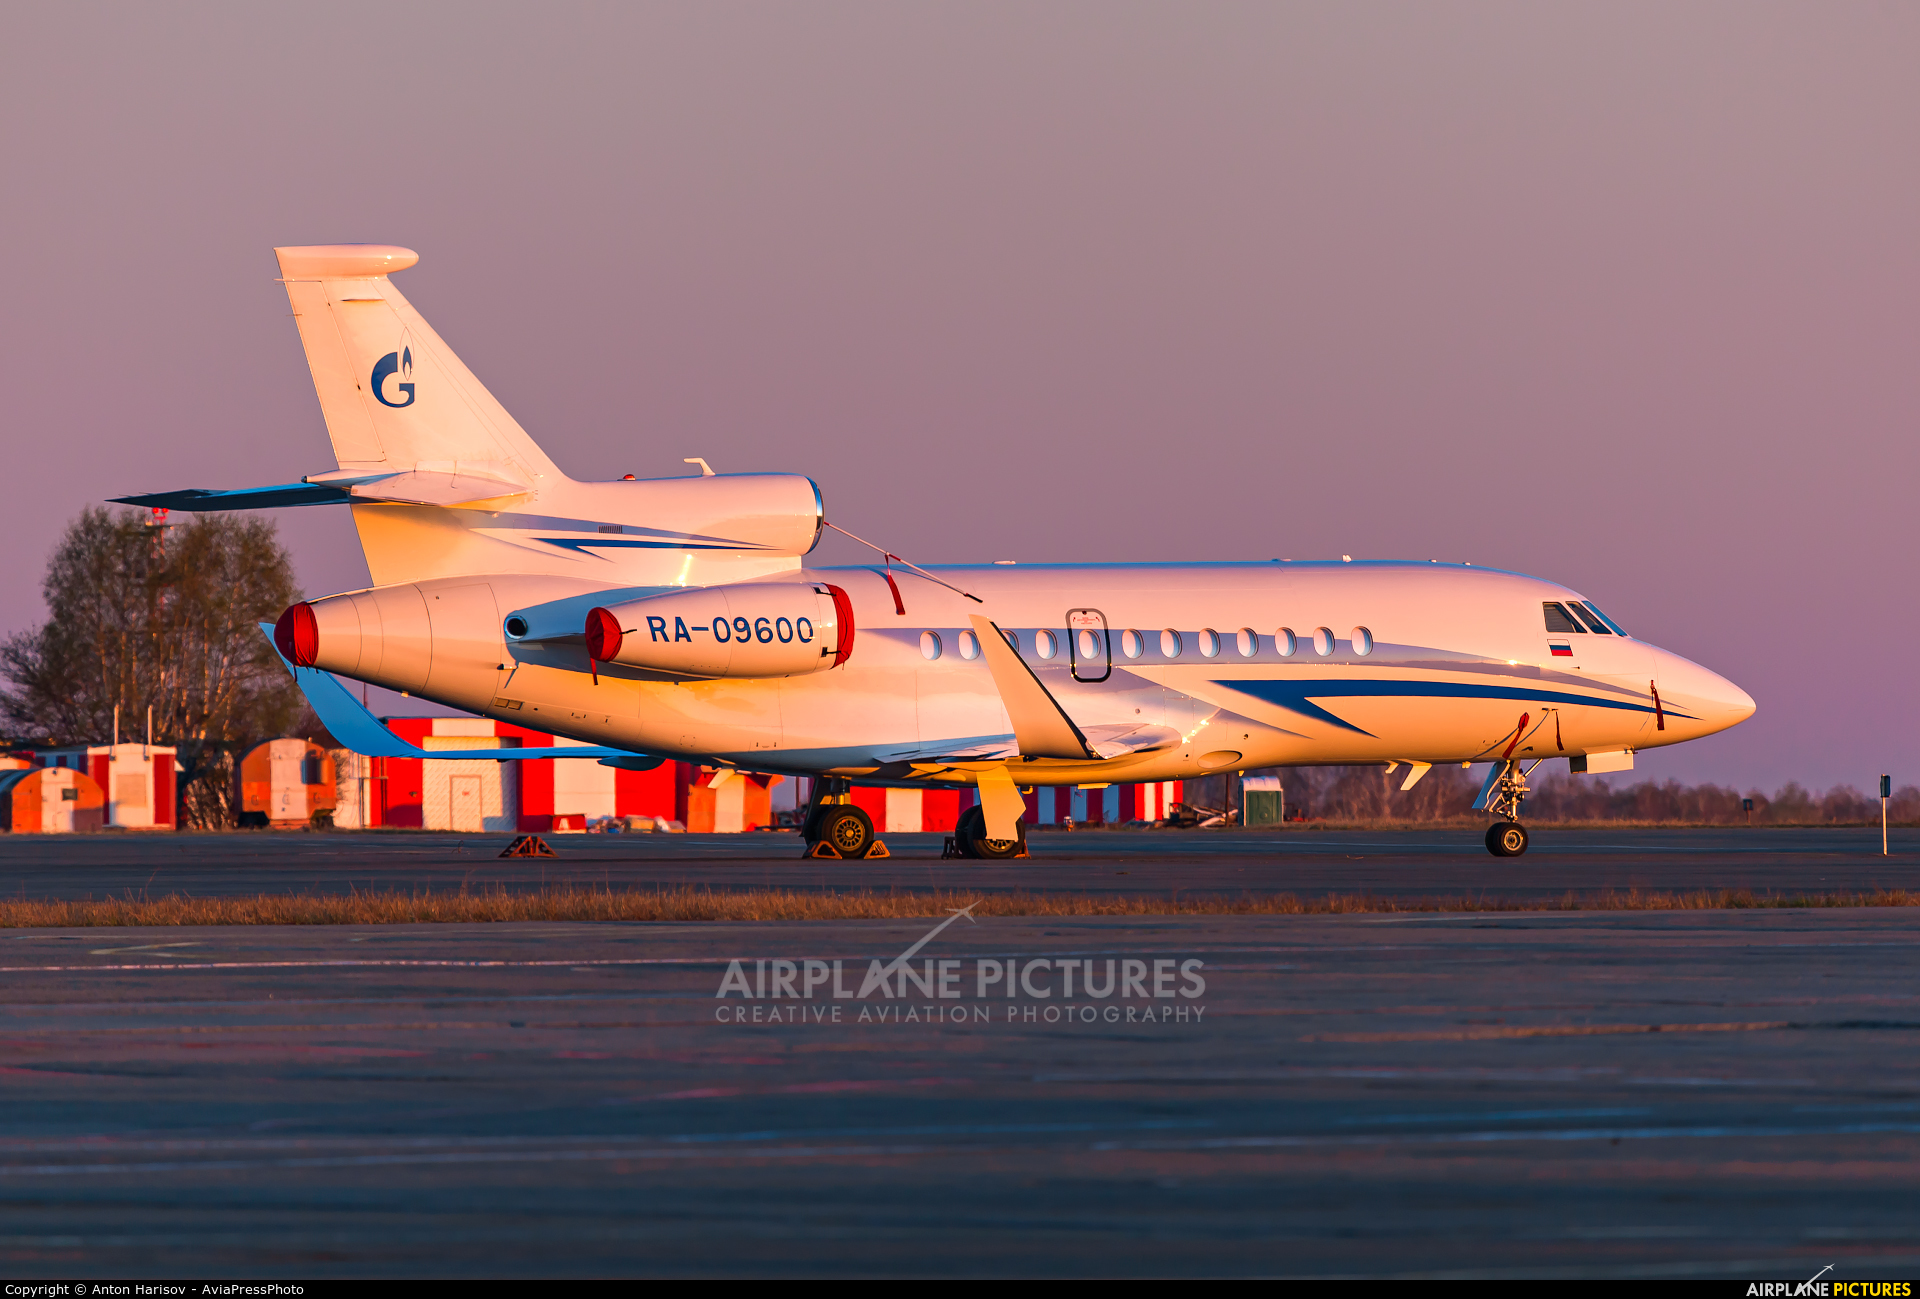 Gazpromavia RA-09600 aircraft at Chelyabinsk